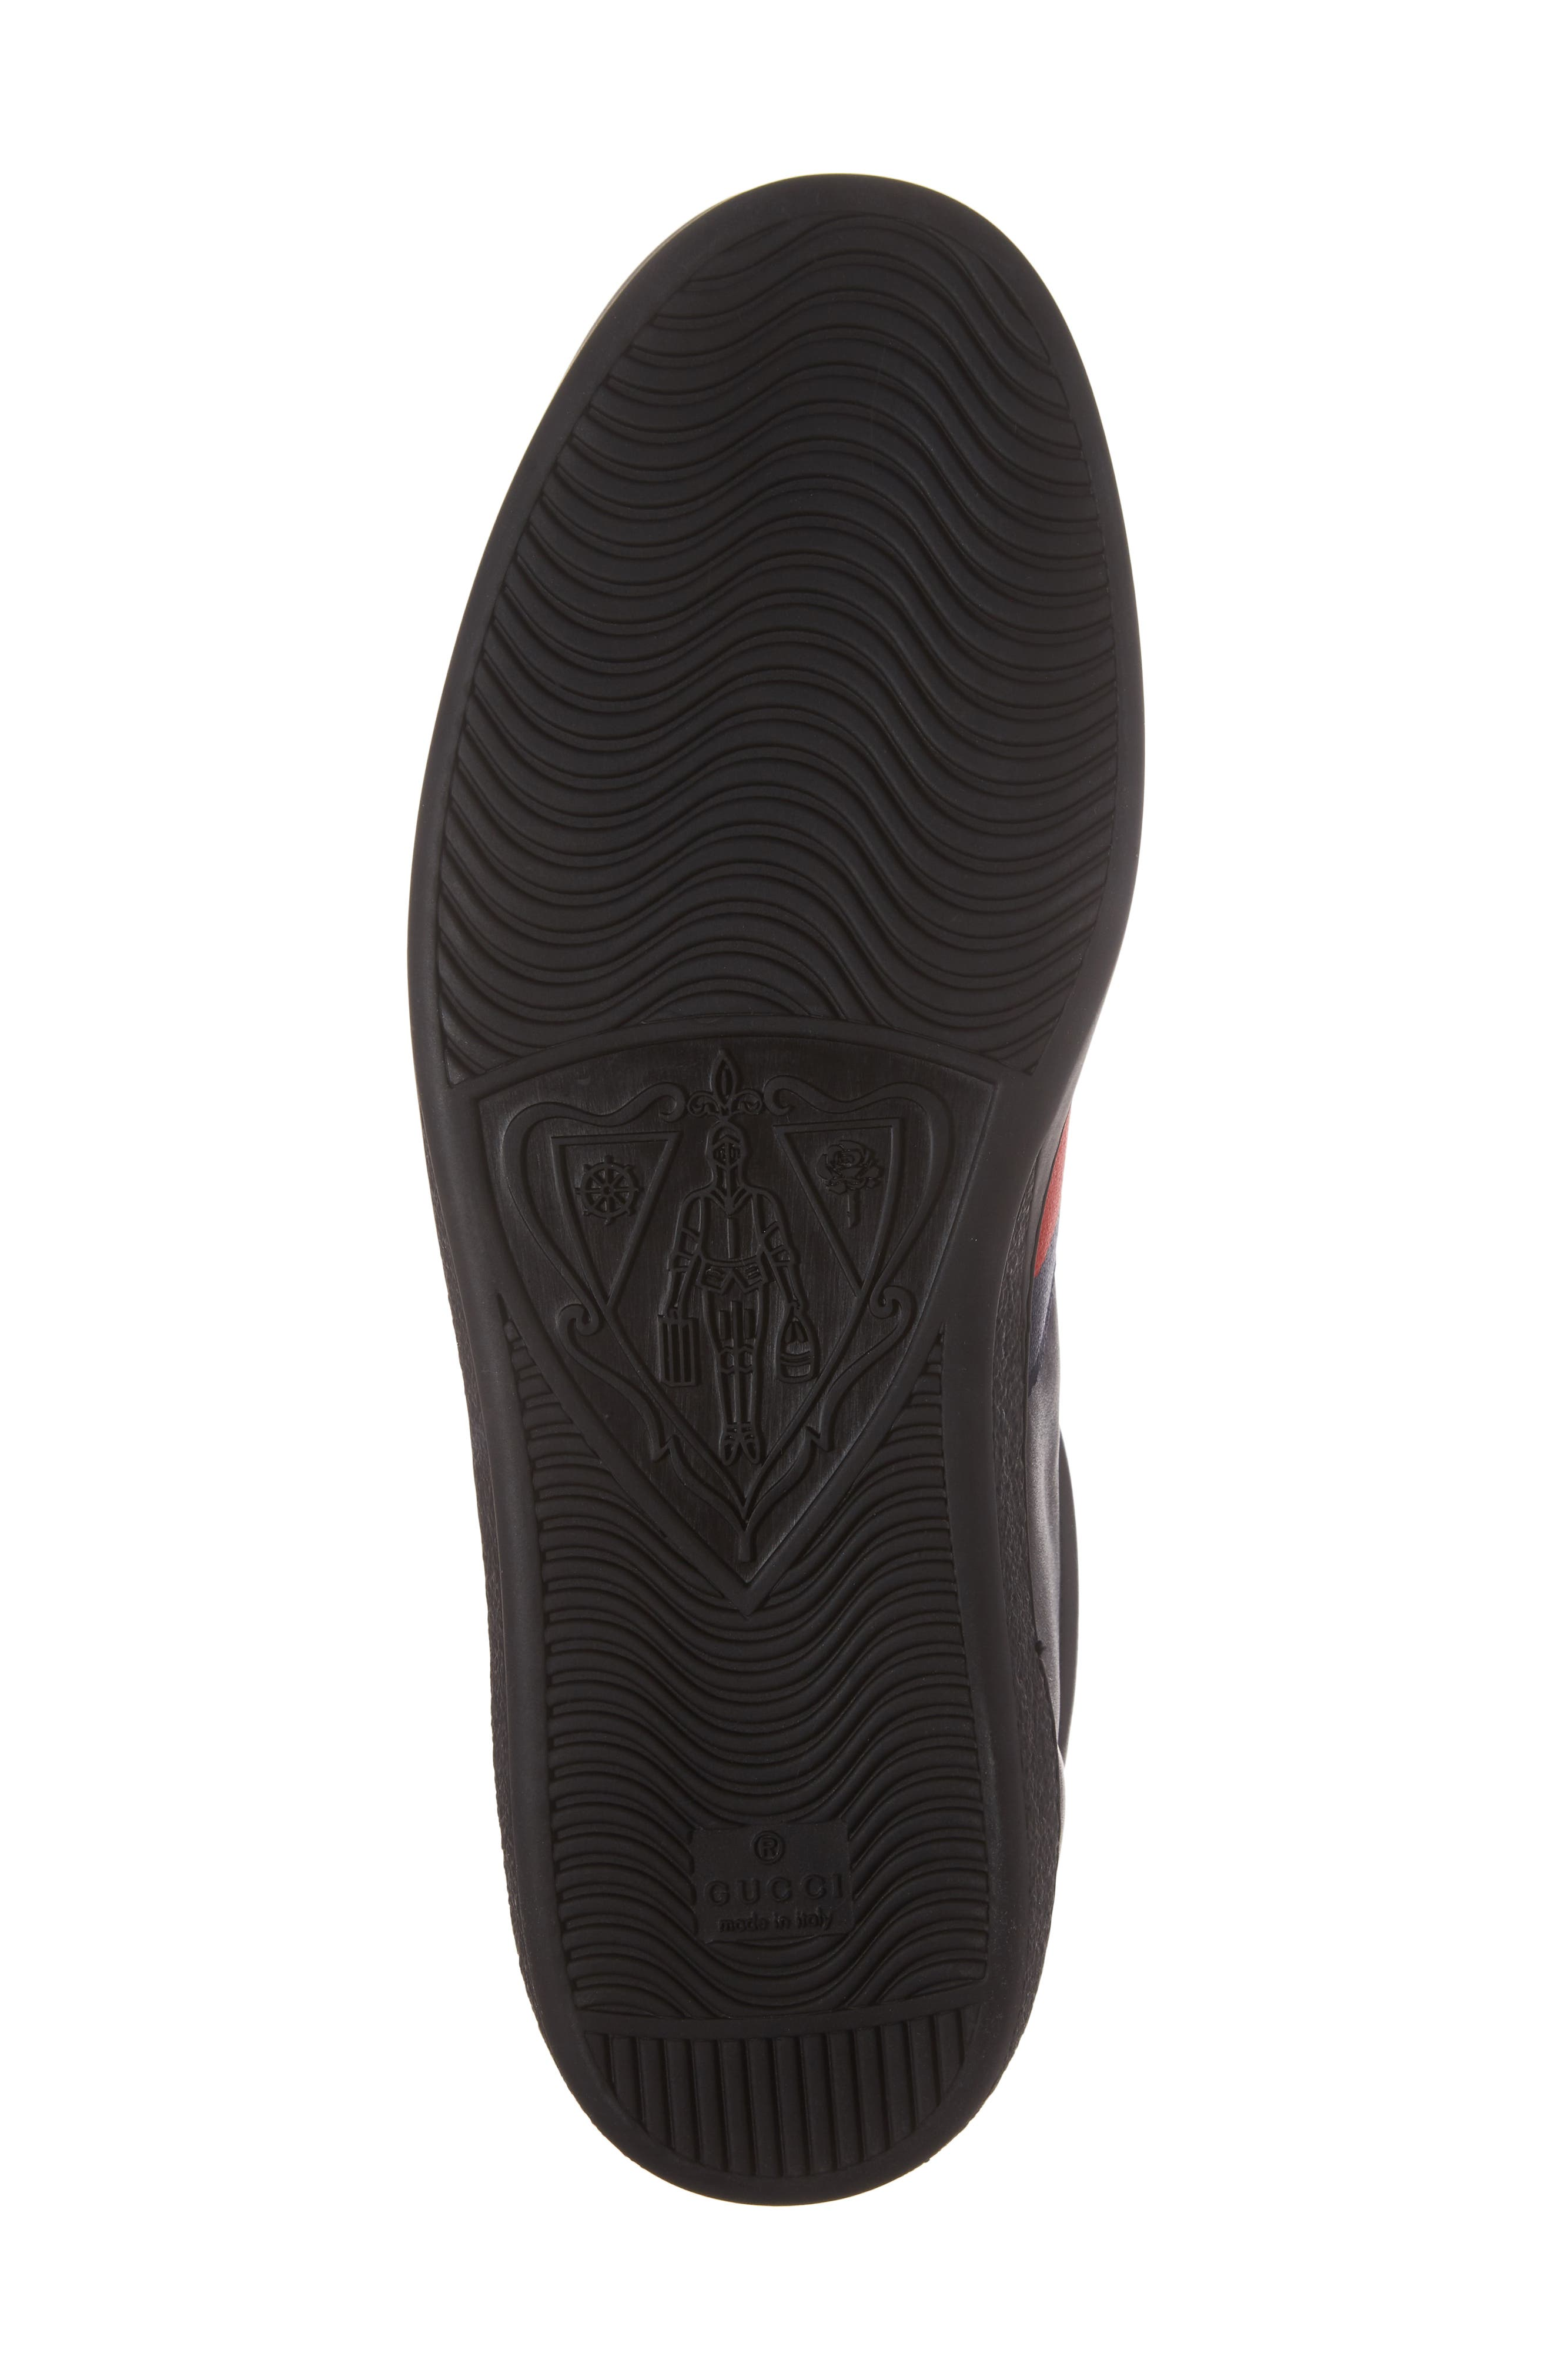 Ace High Top Sneaker,                             Alternate thumbnail 6, color,                             Black